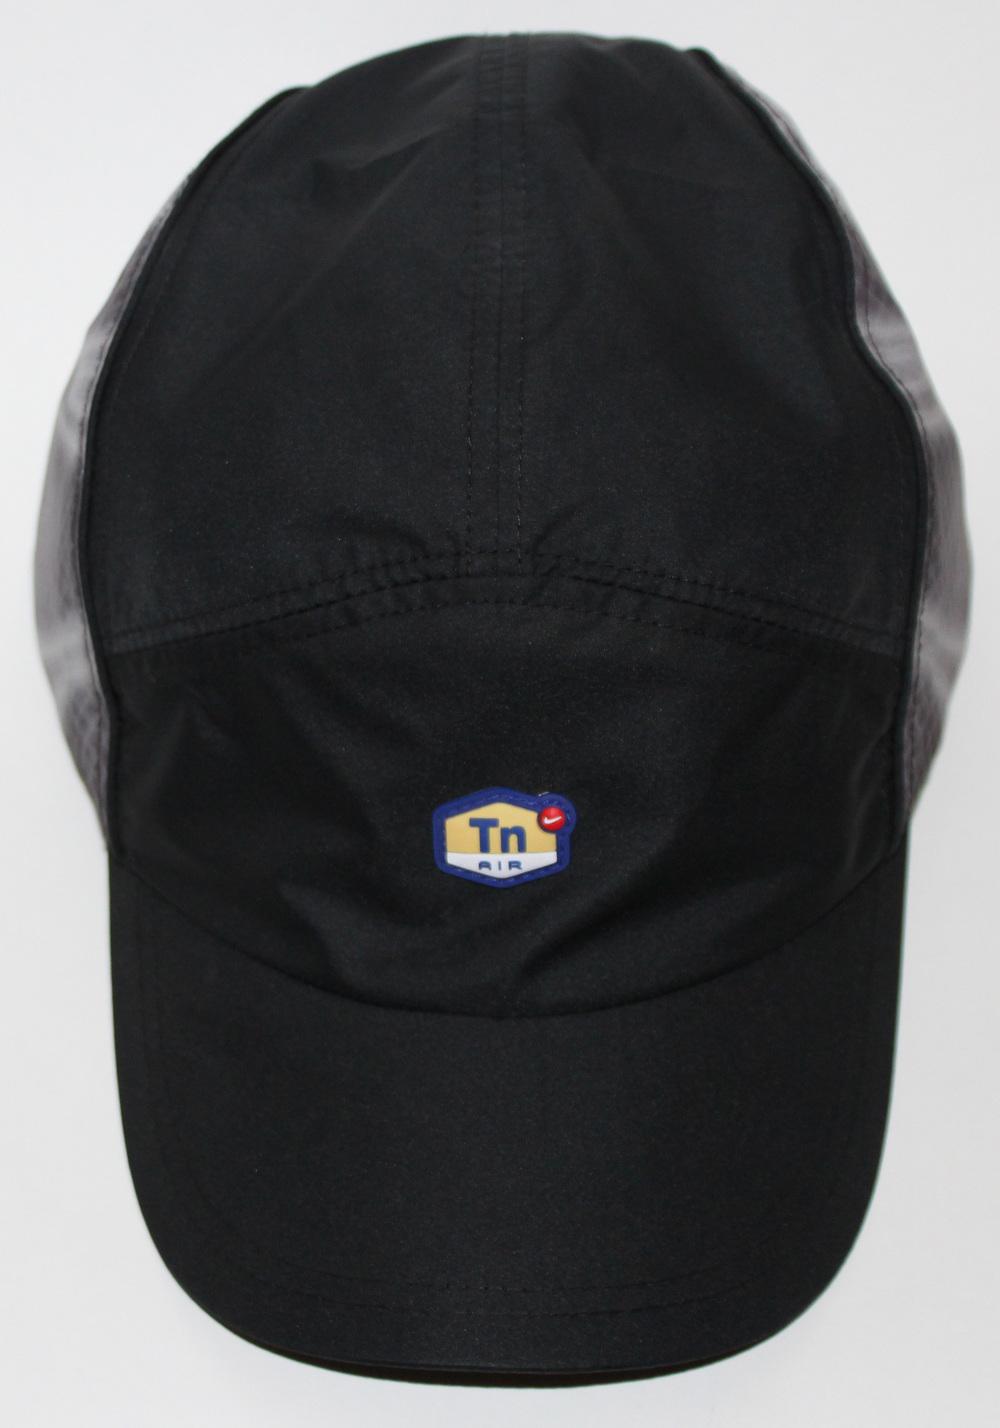 738fc456 Nike (TN) Tuned Air Max Plus 5 Panel Hat Black/Grey